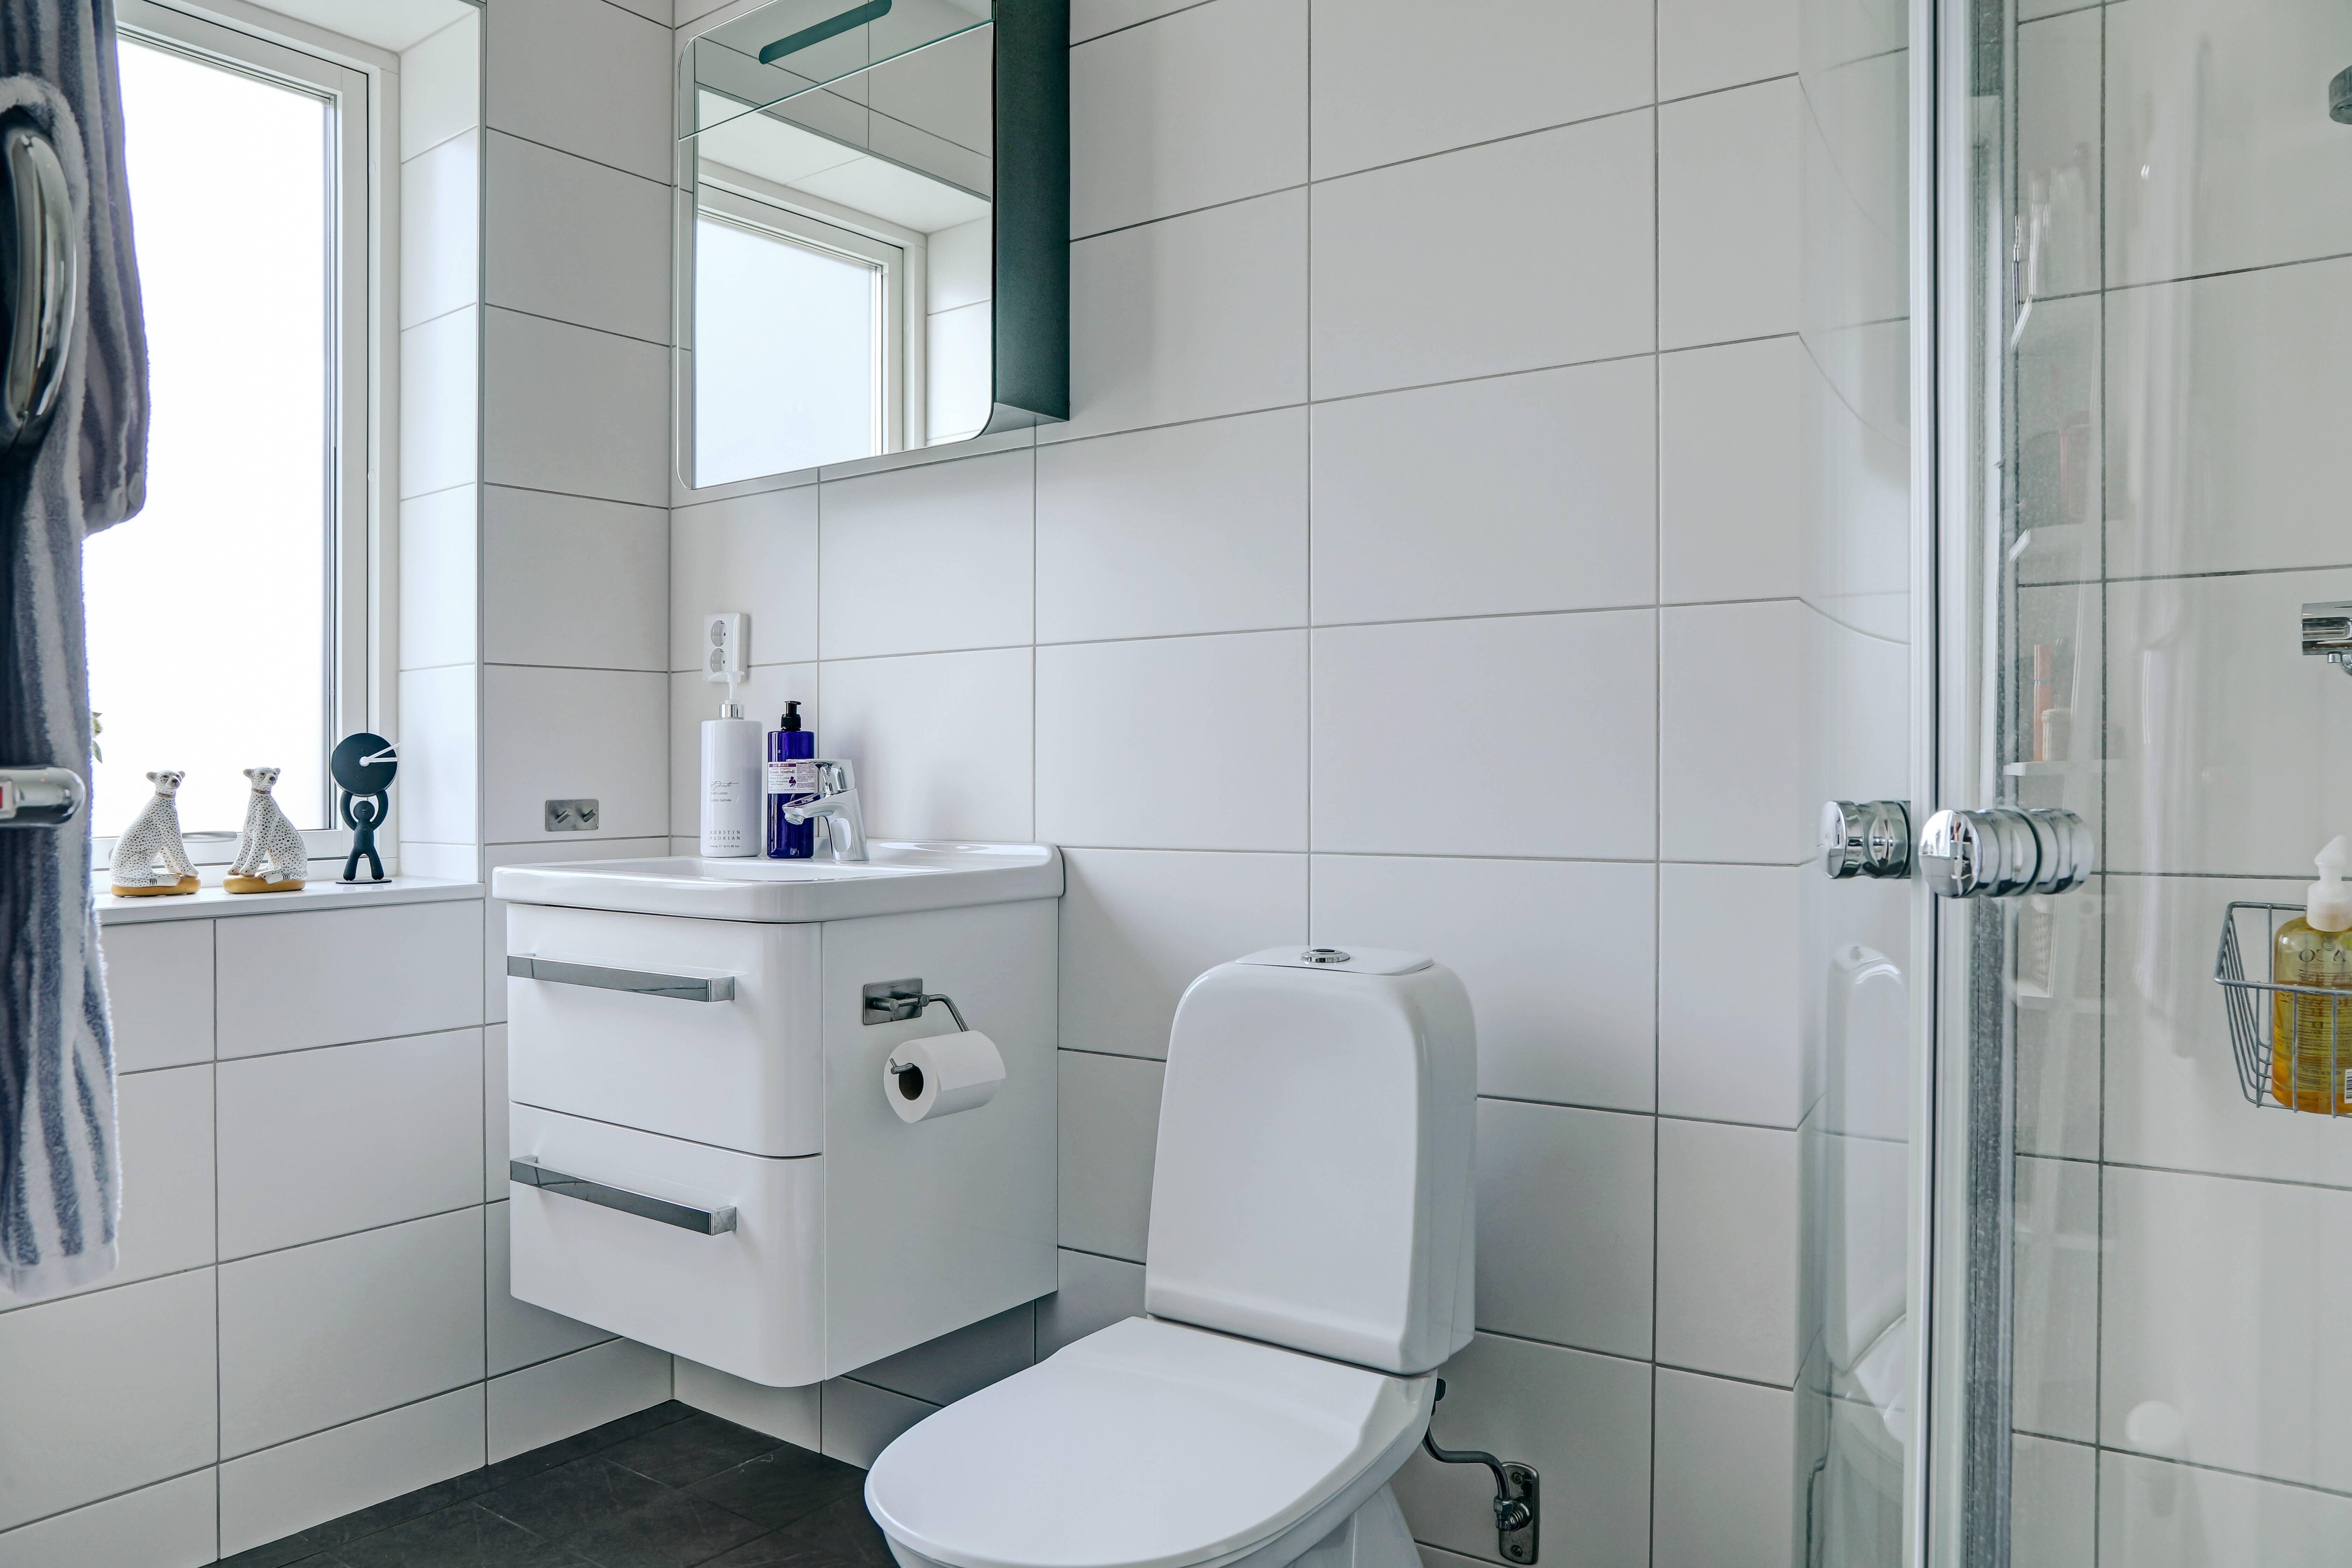 Dubbla helkaklade badrum